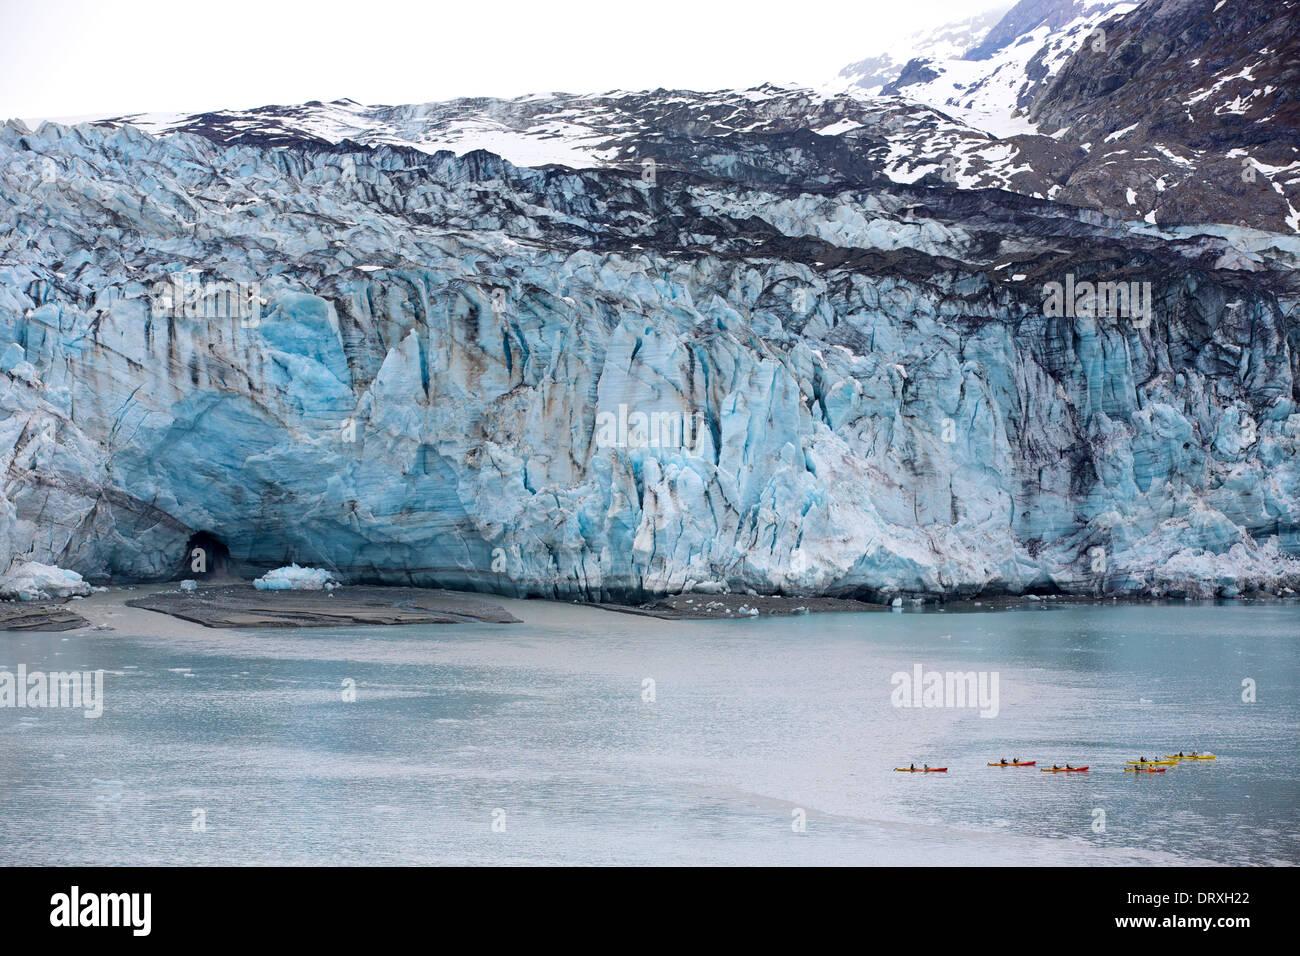 Kayakers in front of the Lamplugh Glacier, Glacier Bay National Park, Alaska - Stock Image